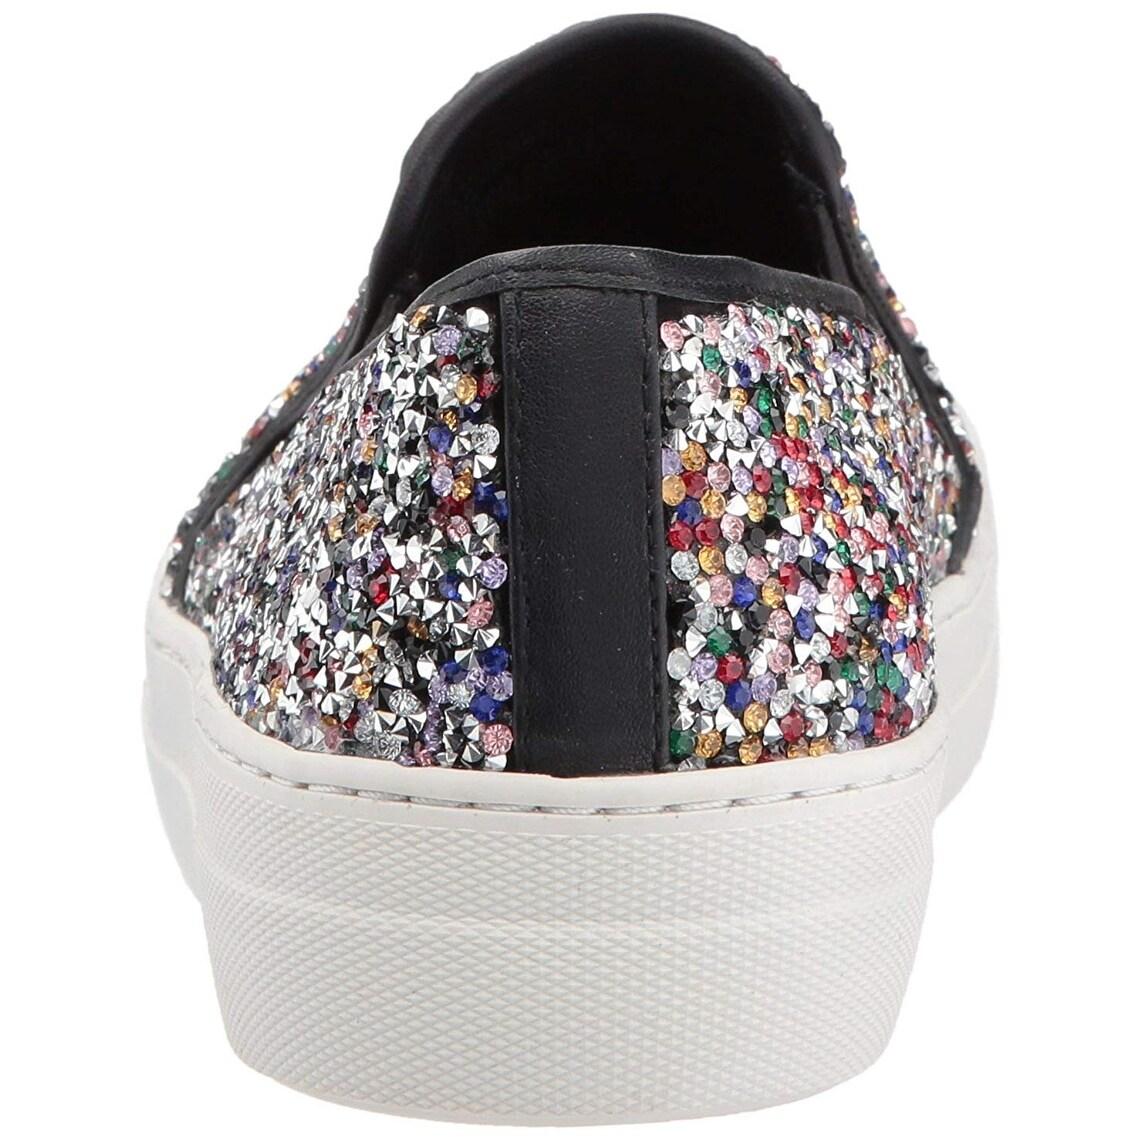 d3e49e3ce67 Shop Steve Madden Women s Gracious Sneaker - 6 - Free Shipping Today -  Overstock - 23125417